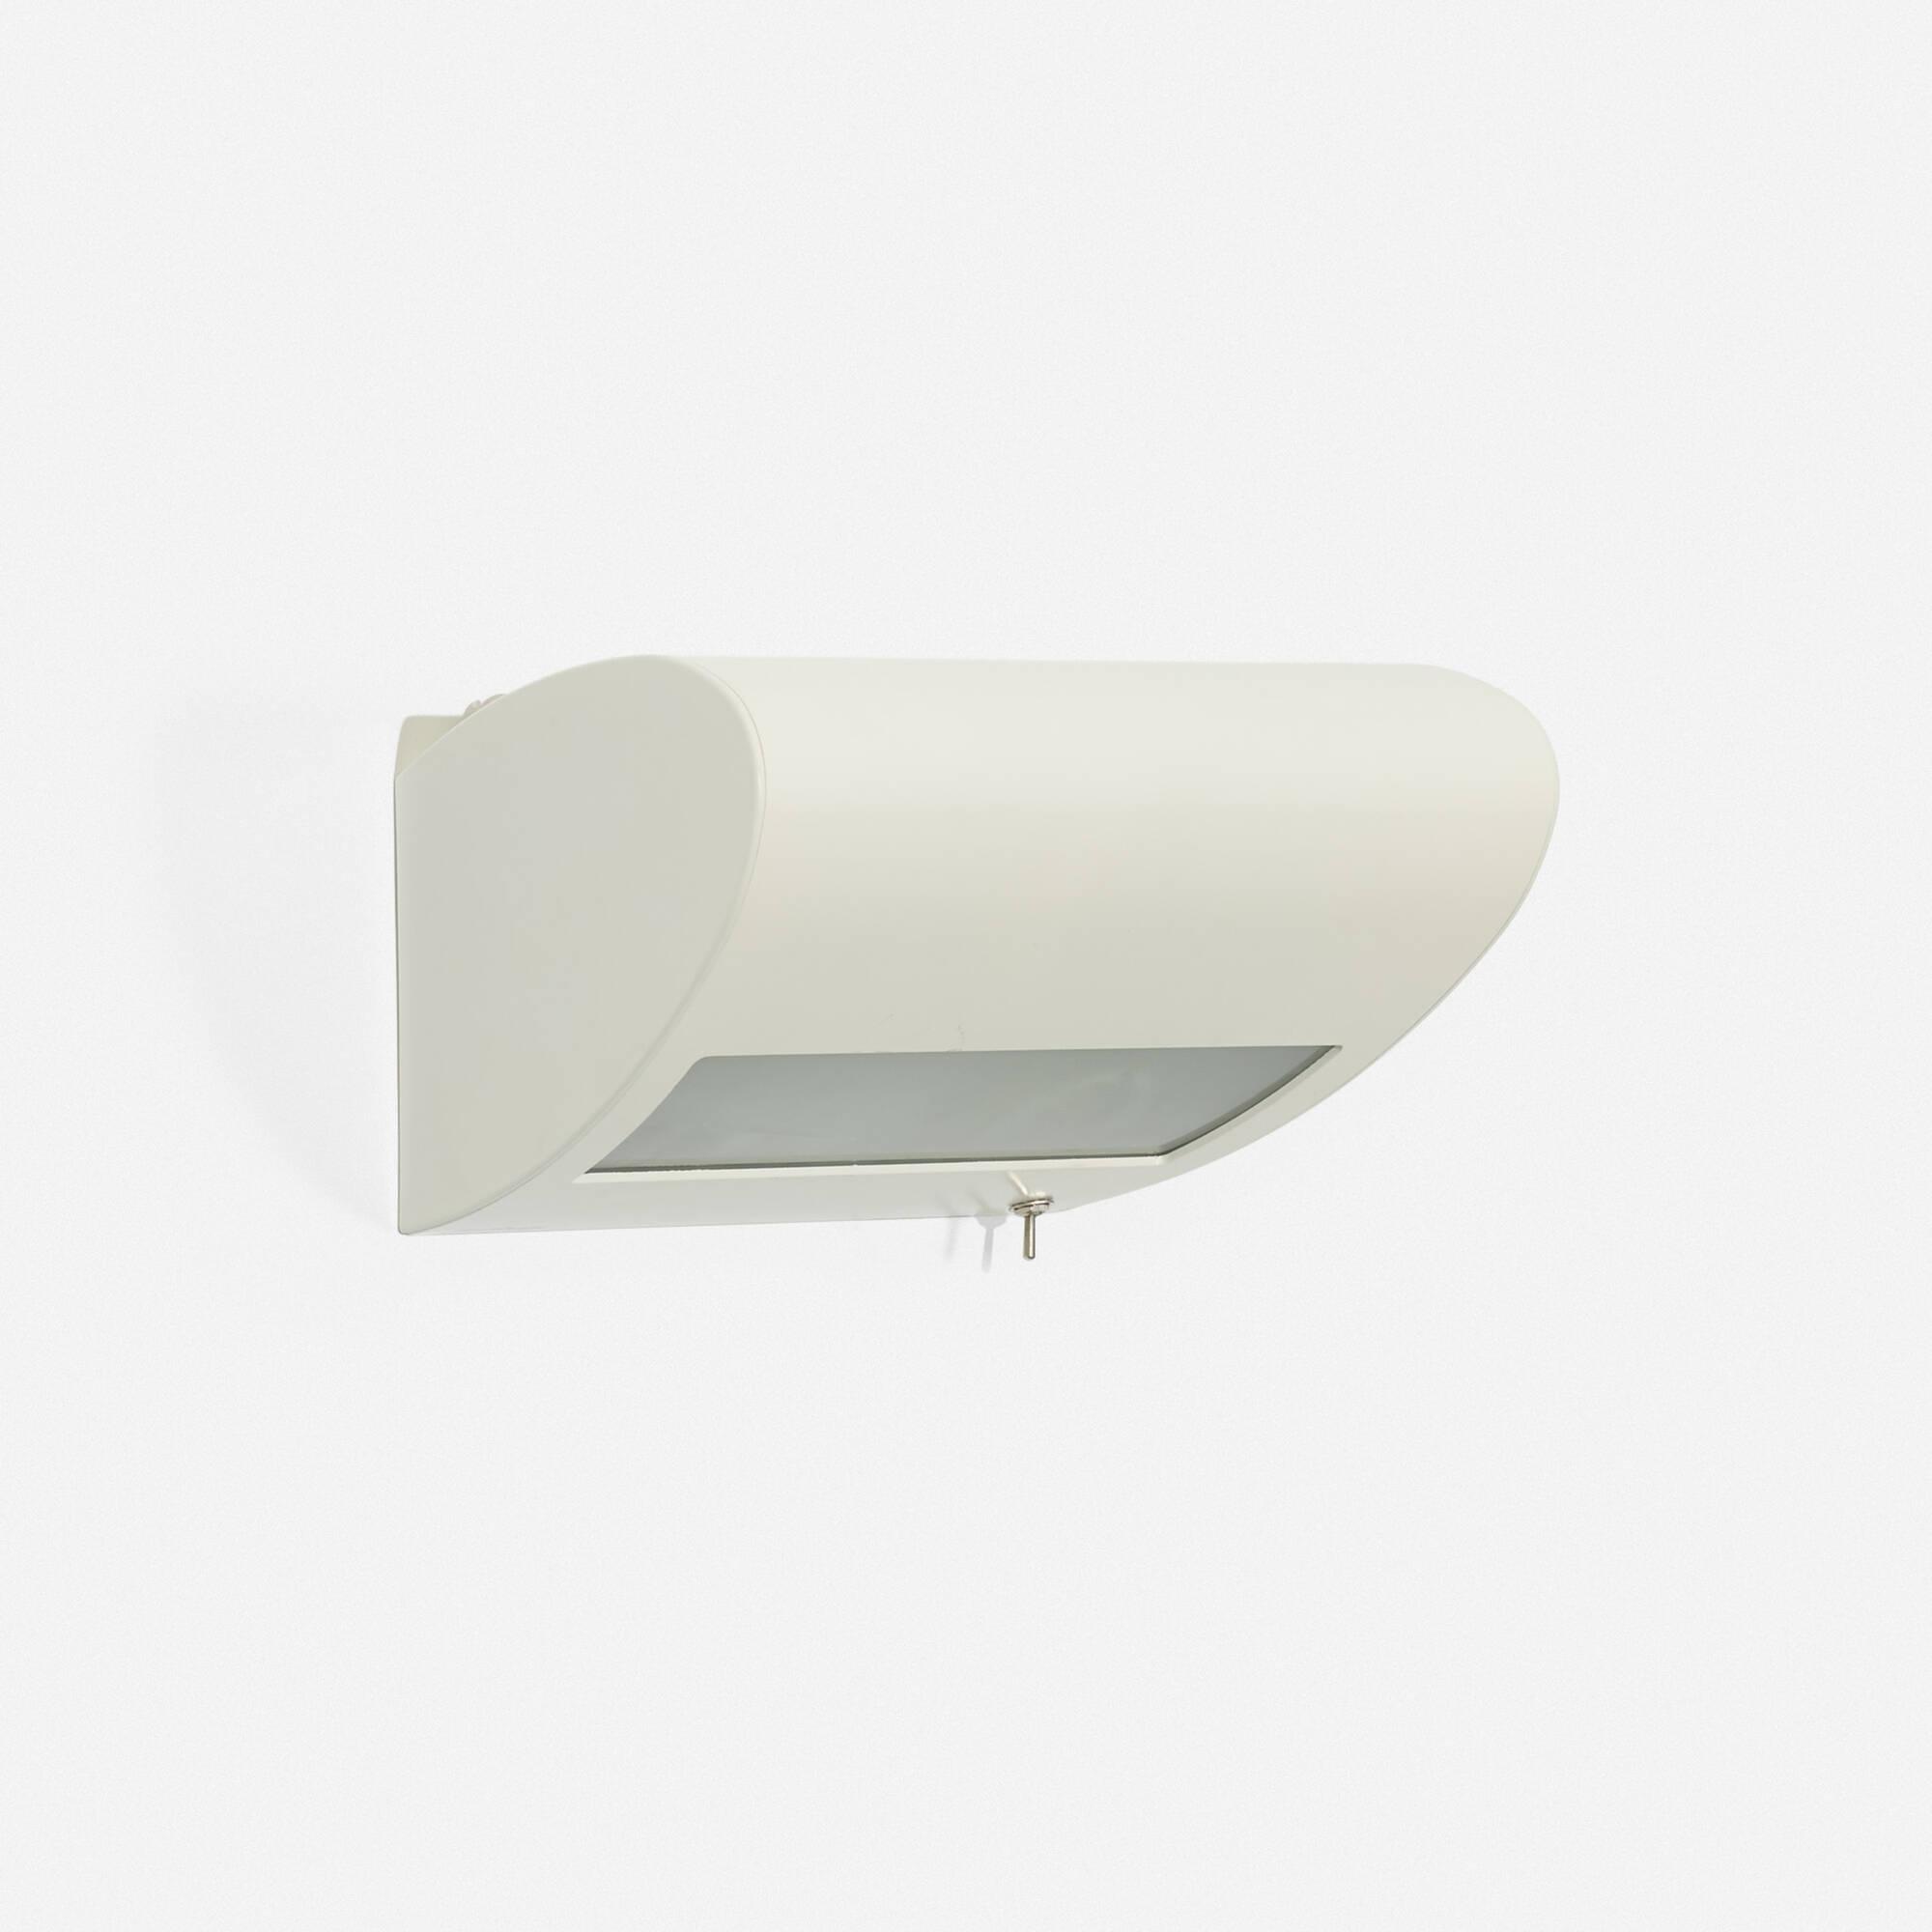 243: Le Corbusier / Bresil sconce (1 of 1)